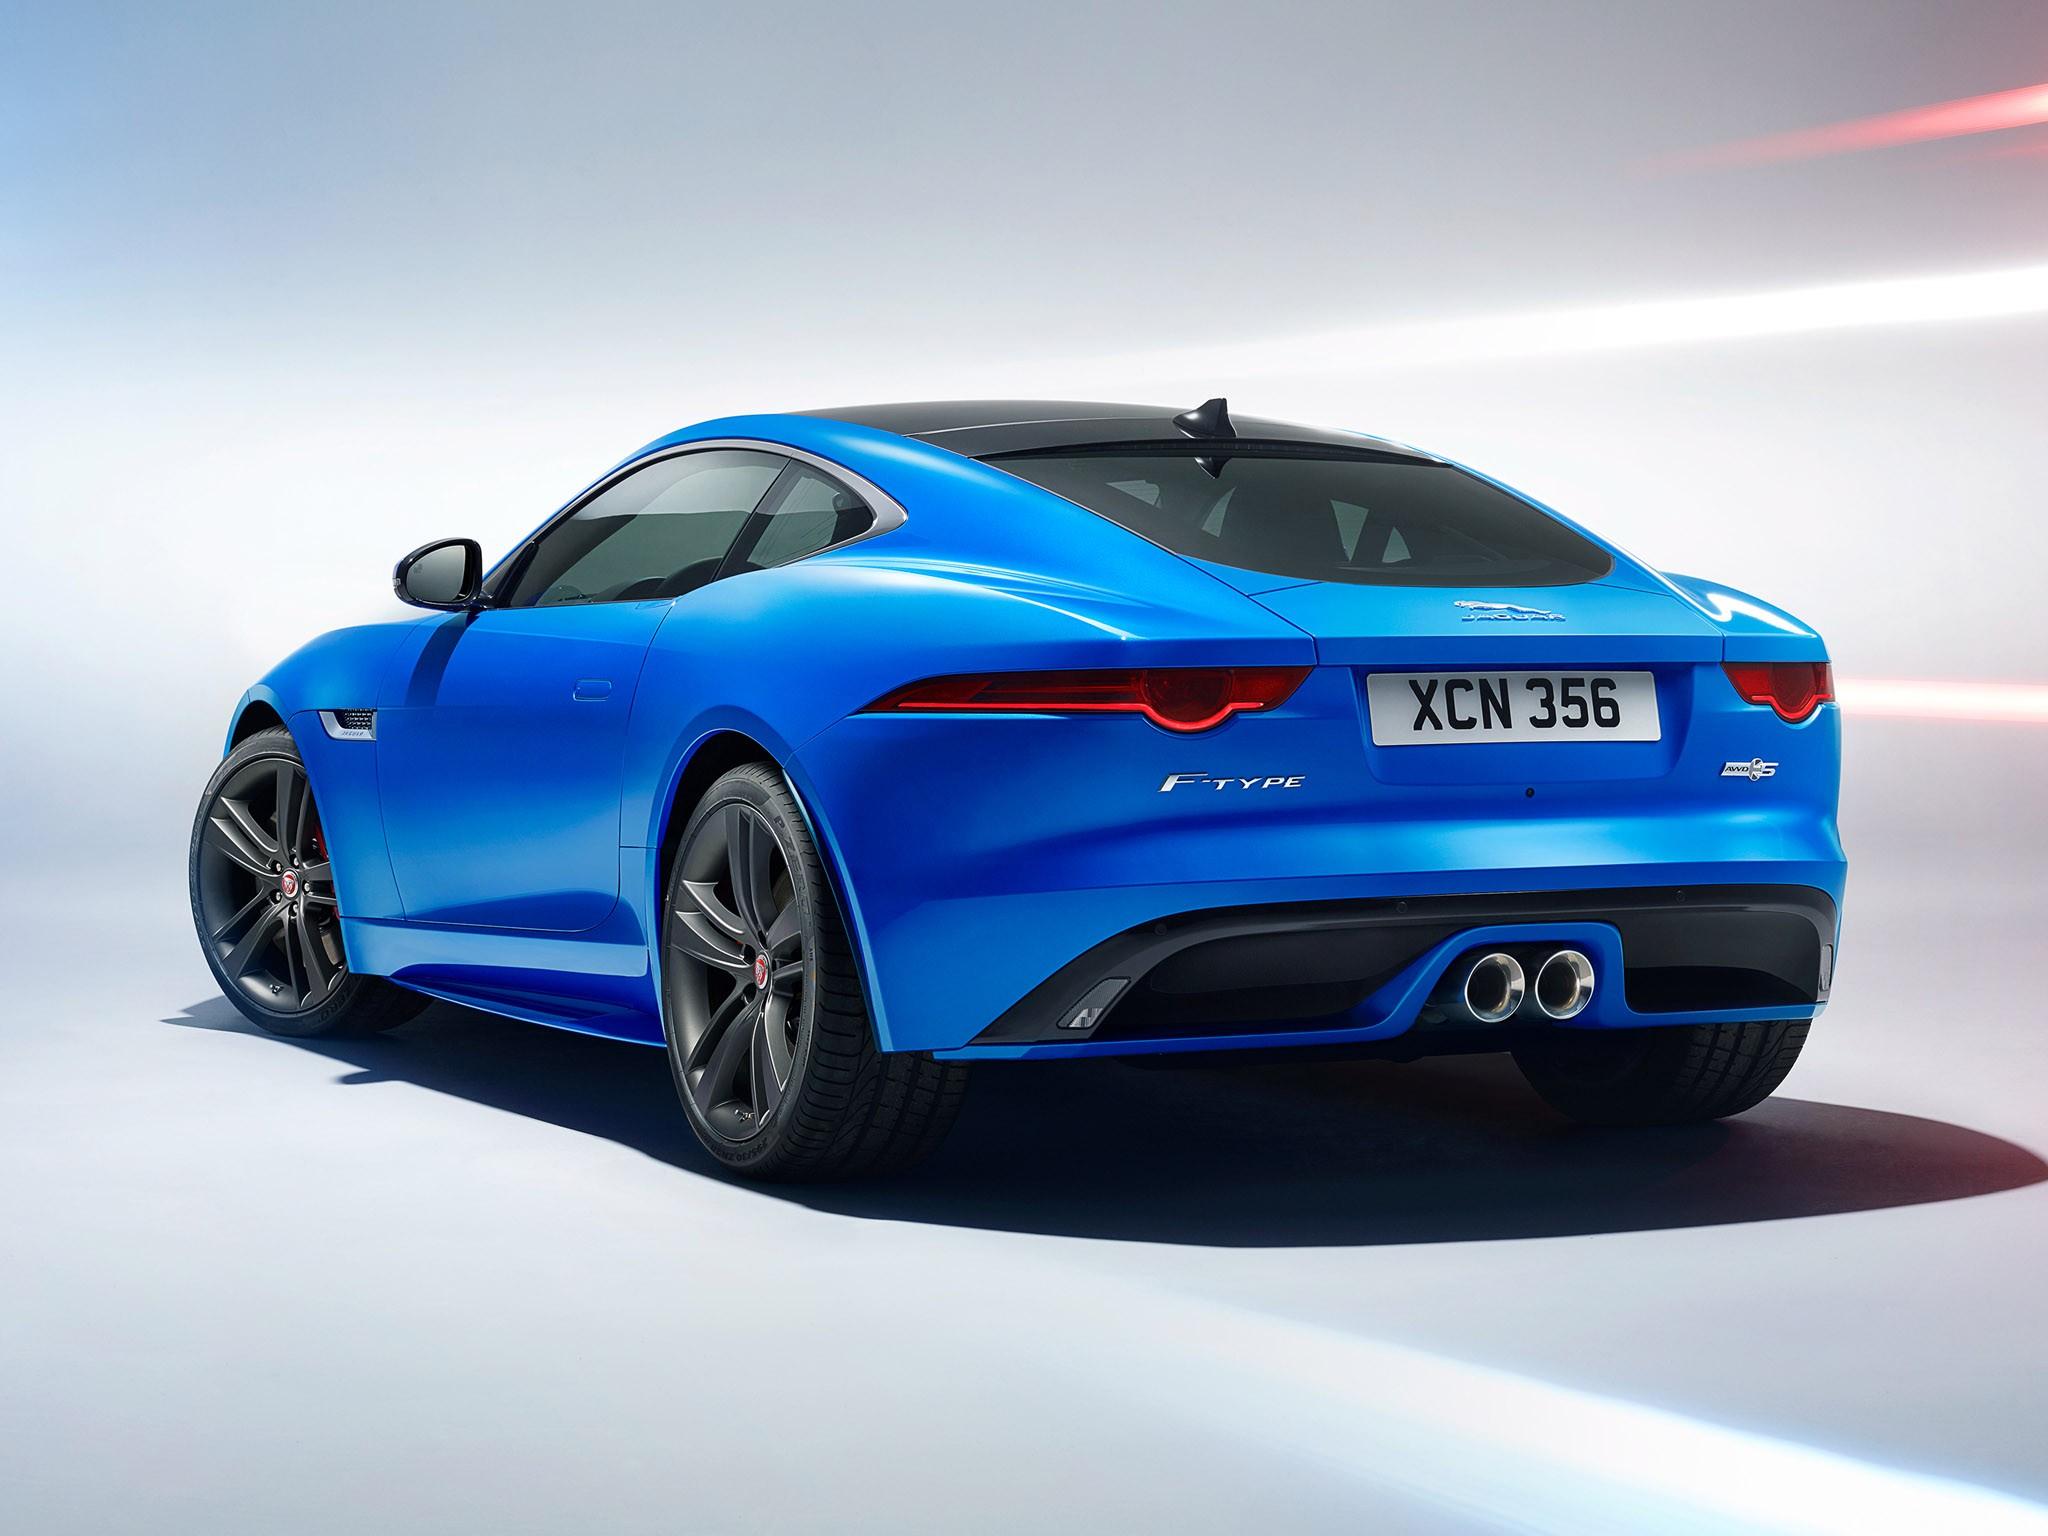 2016 Jaguar F-Type S Coupe awd British Design Edition